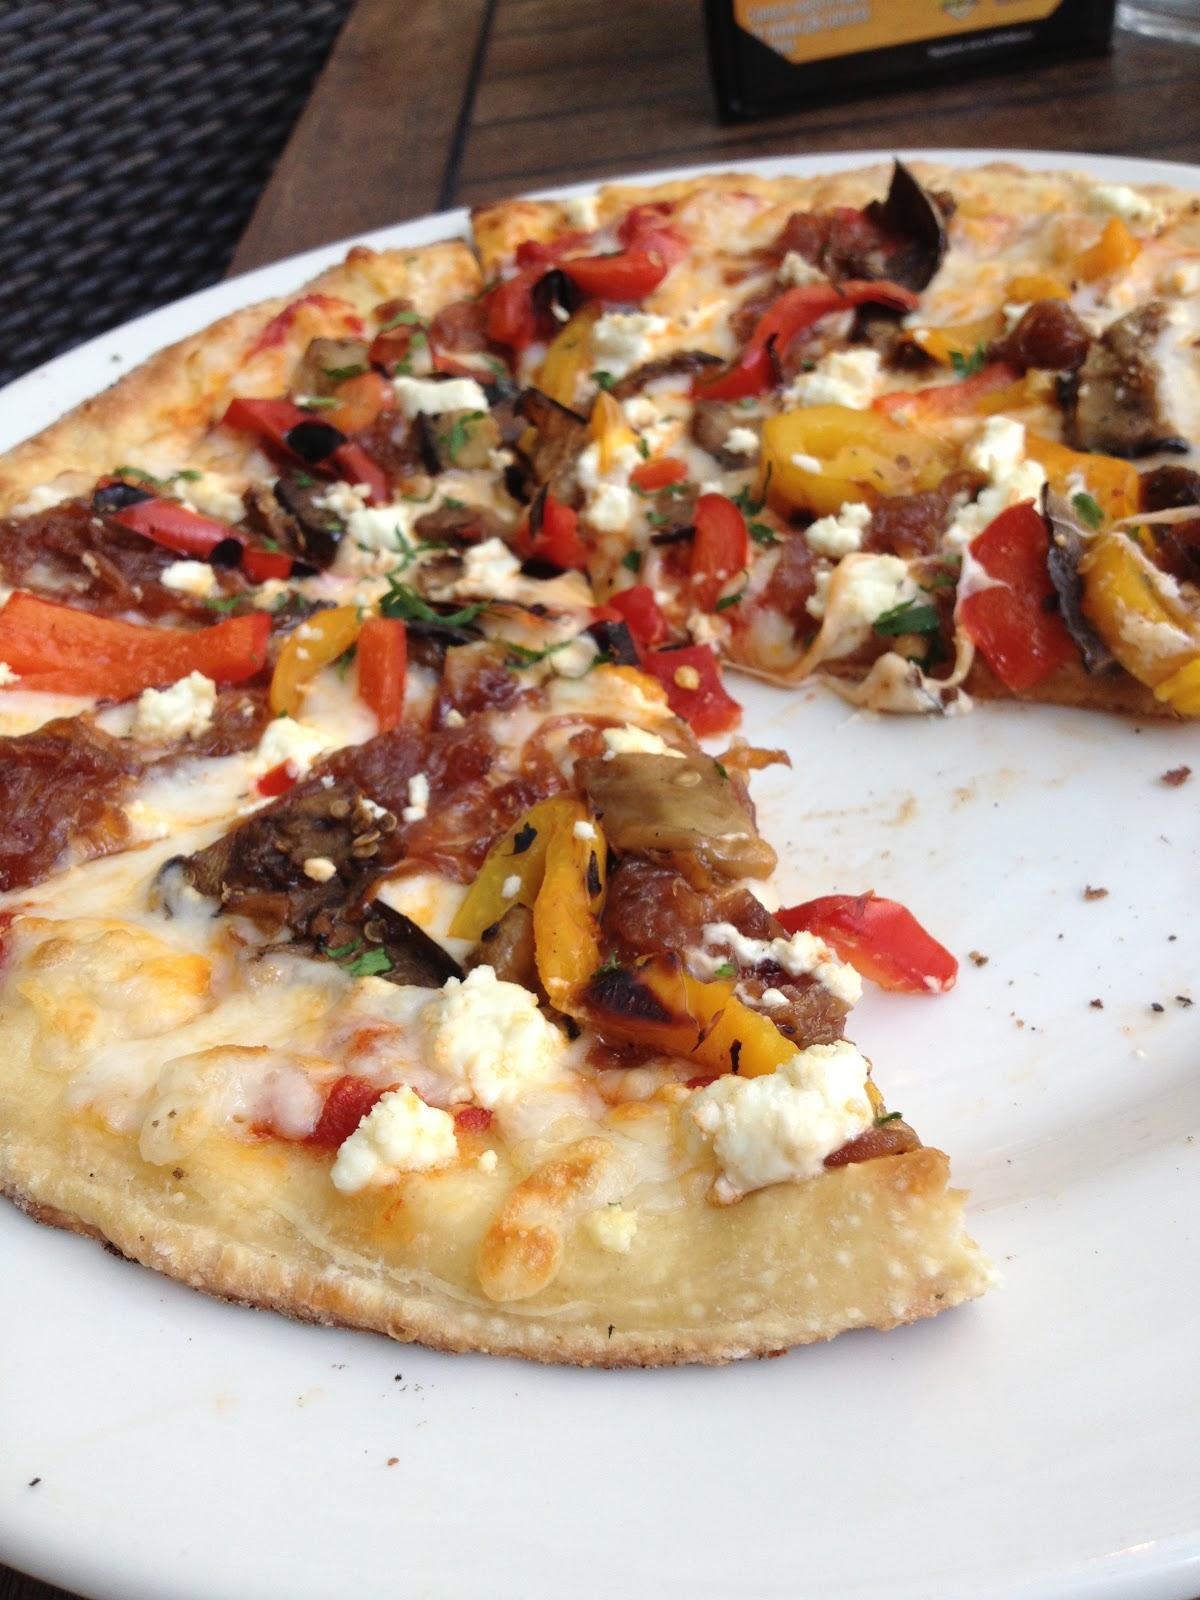 Come Vegetariano: California Pizza Kitchen - México DF